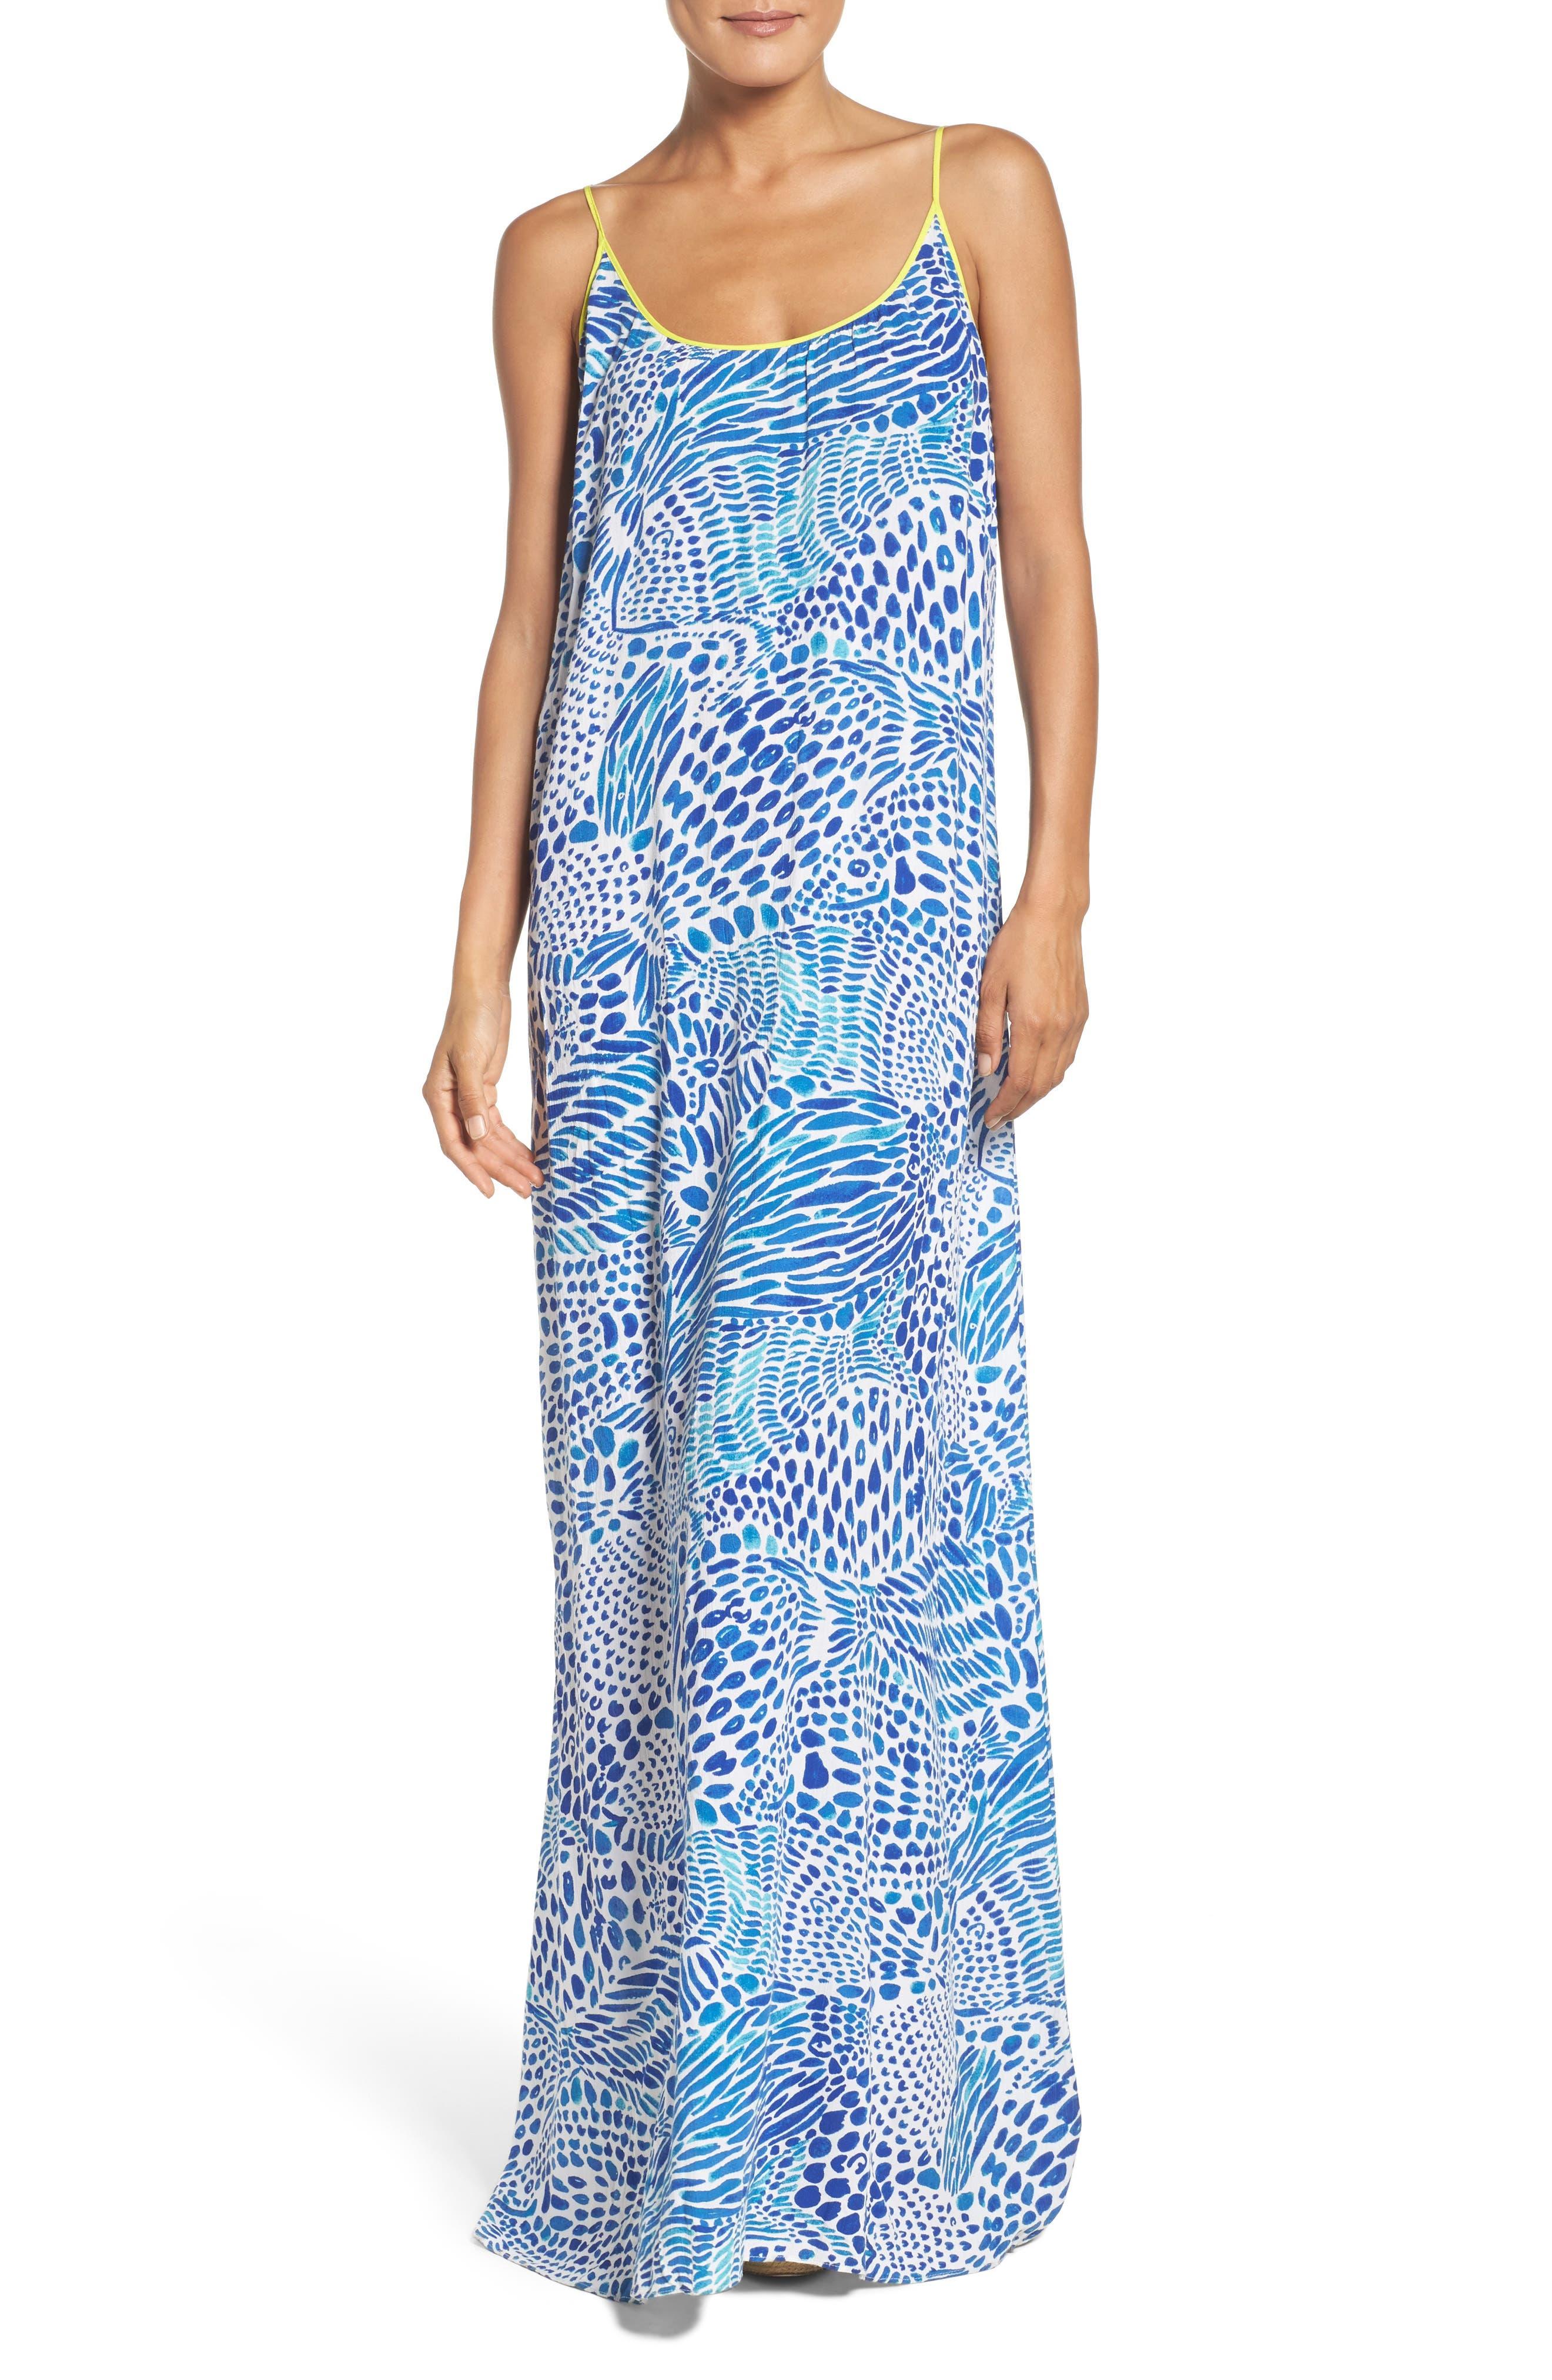 LILLY PULITZER® Kendra Maxi Dress